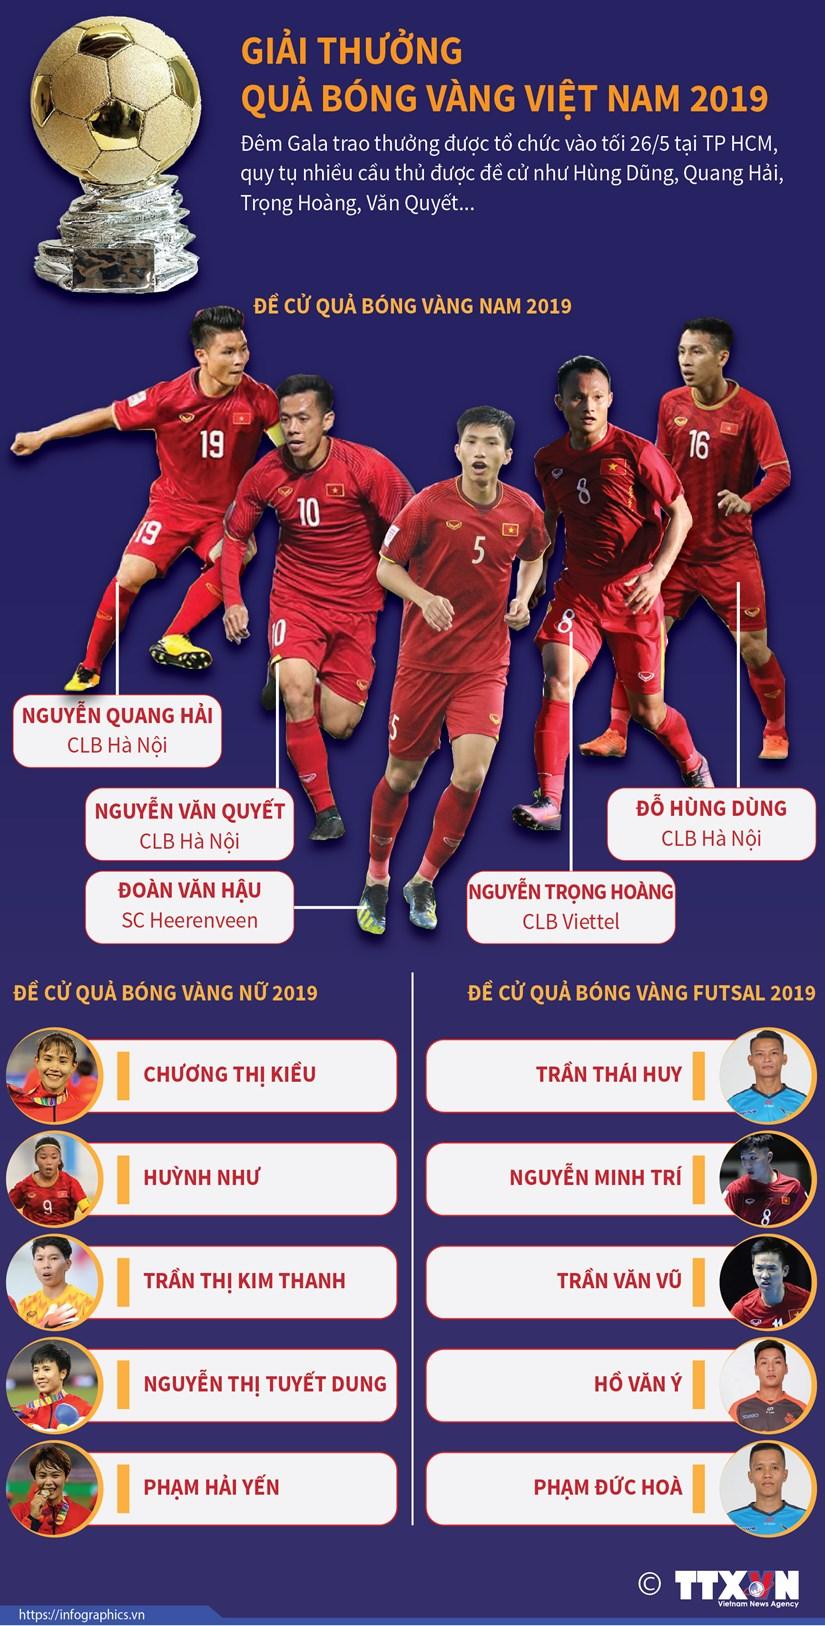 [Infographics] Giai thuong Qua bong Vang Viet Nam 2019 hinh anh 1